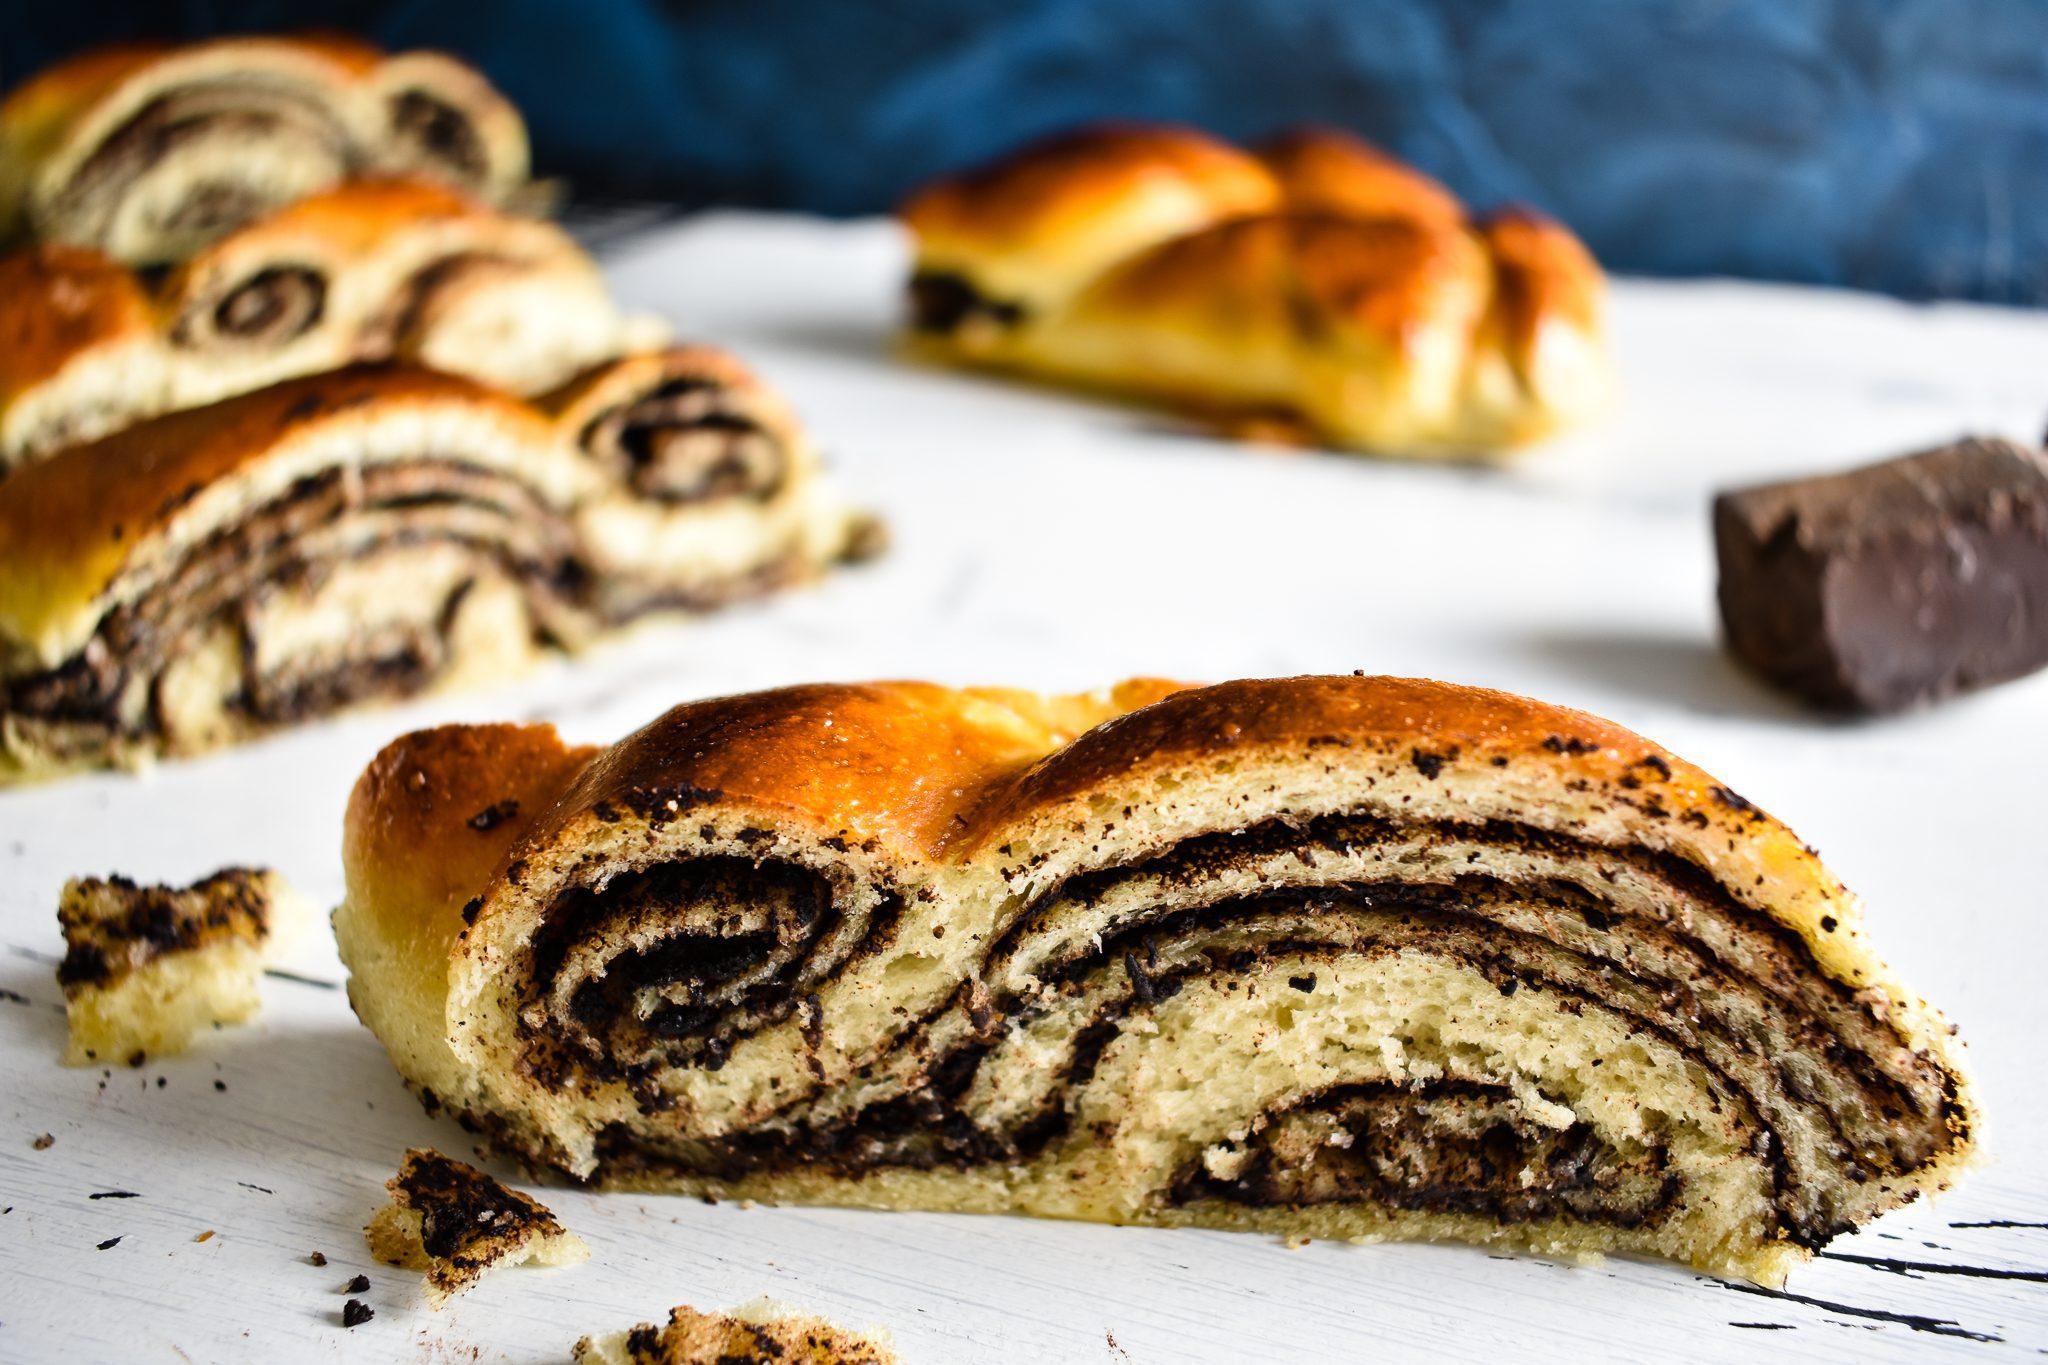 Braided-bread-recipe-with-chocolate-filling-1-SunCakeMom